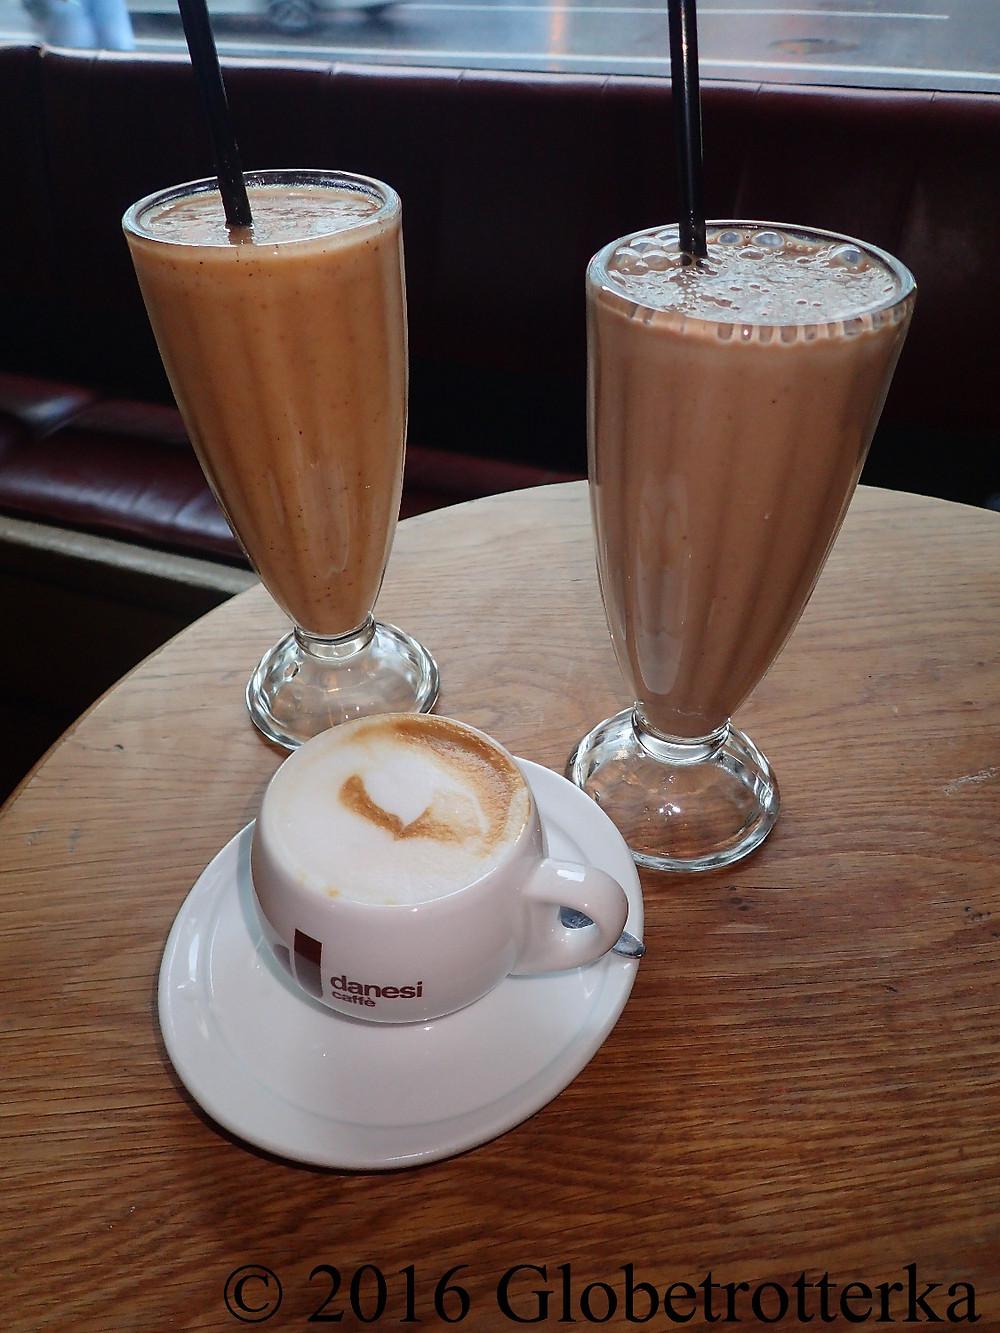 Smoothies chocolat-banane-amande (droite), smoothie fraise-banane (gauche) et capuccino